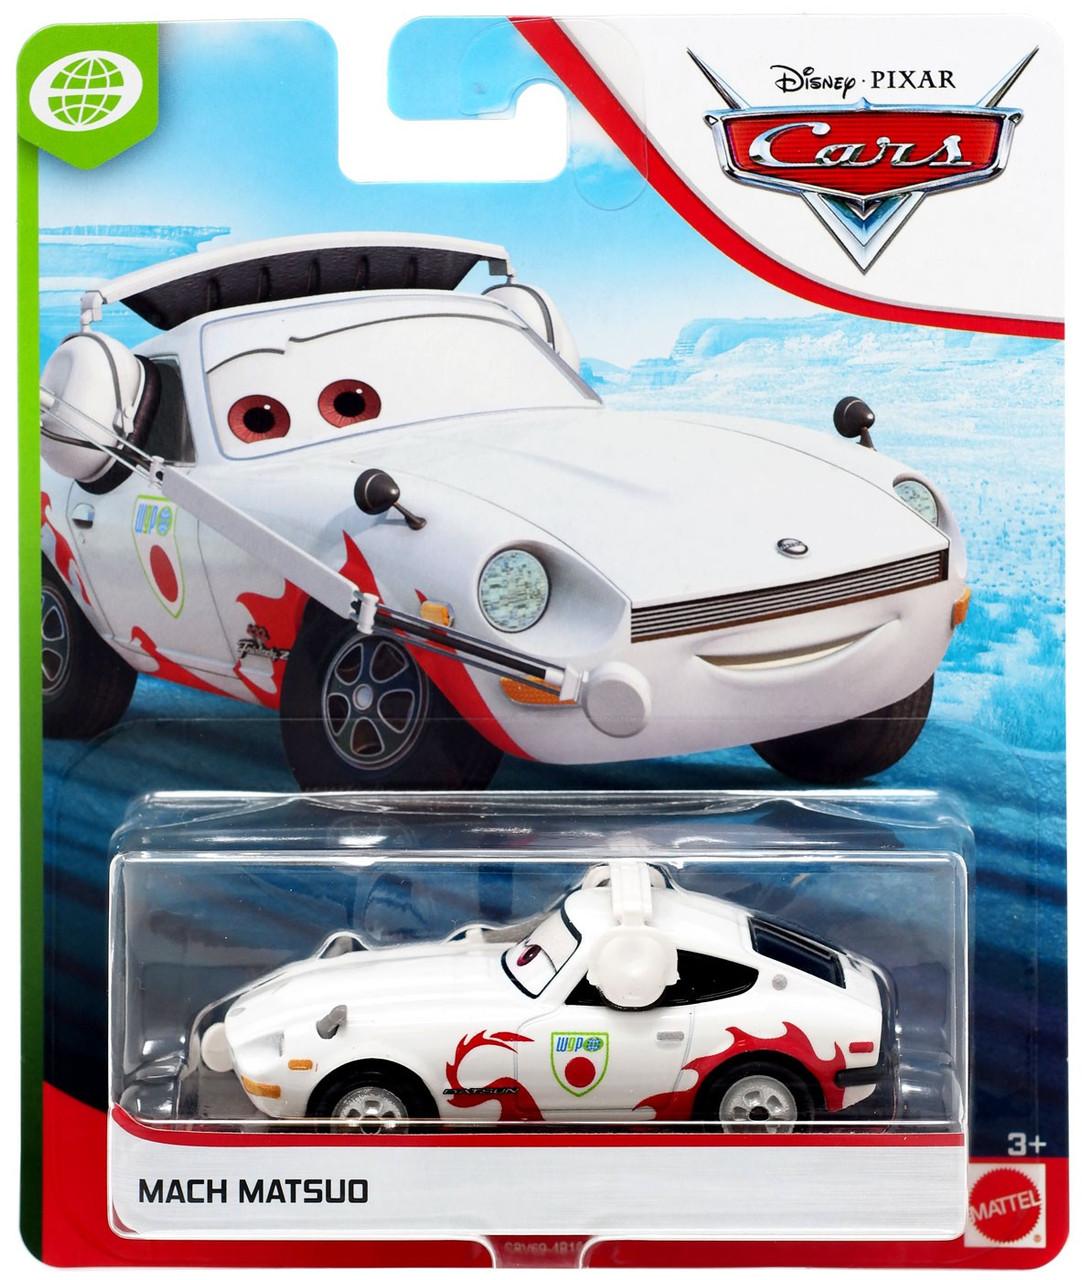 Disney Pixar Cars Wgp Mach Matsuo 155 Diecast Car Mattel Toys Toywiz